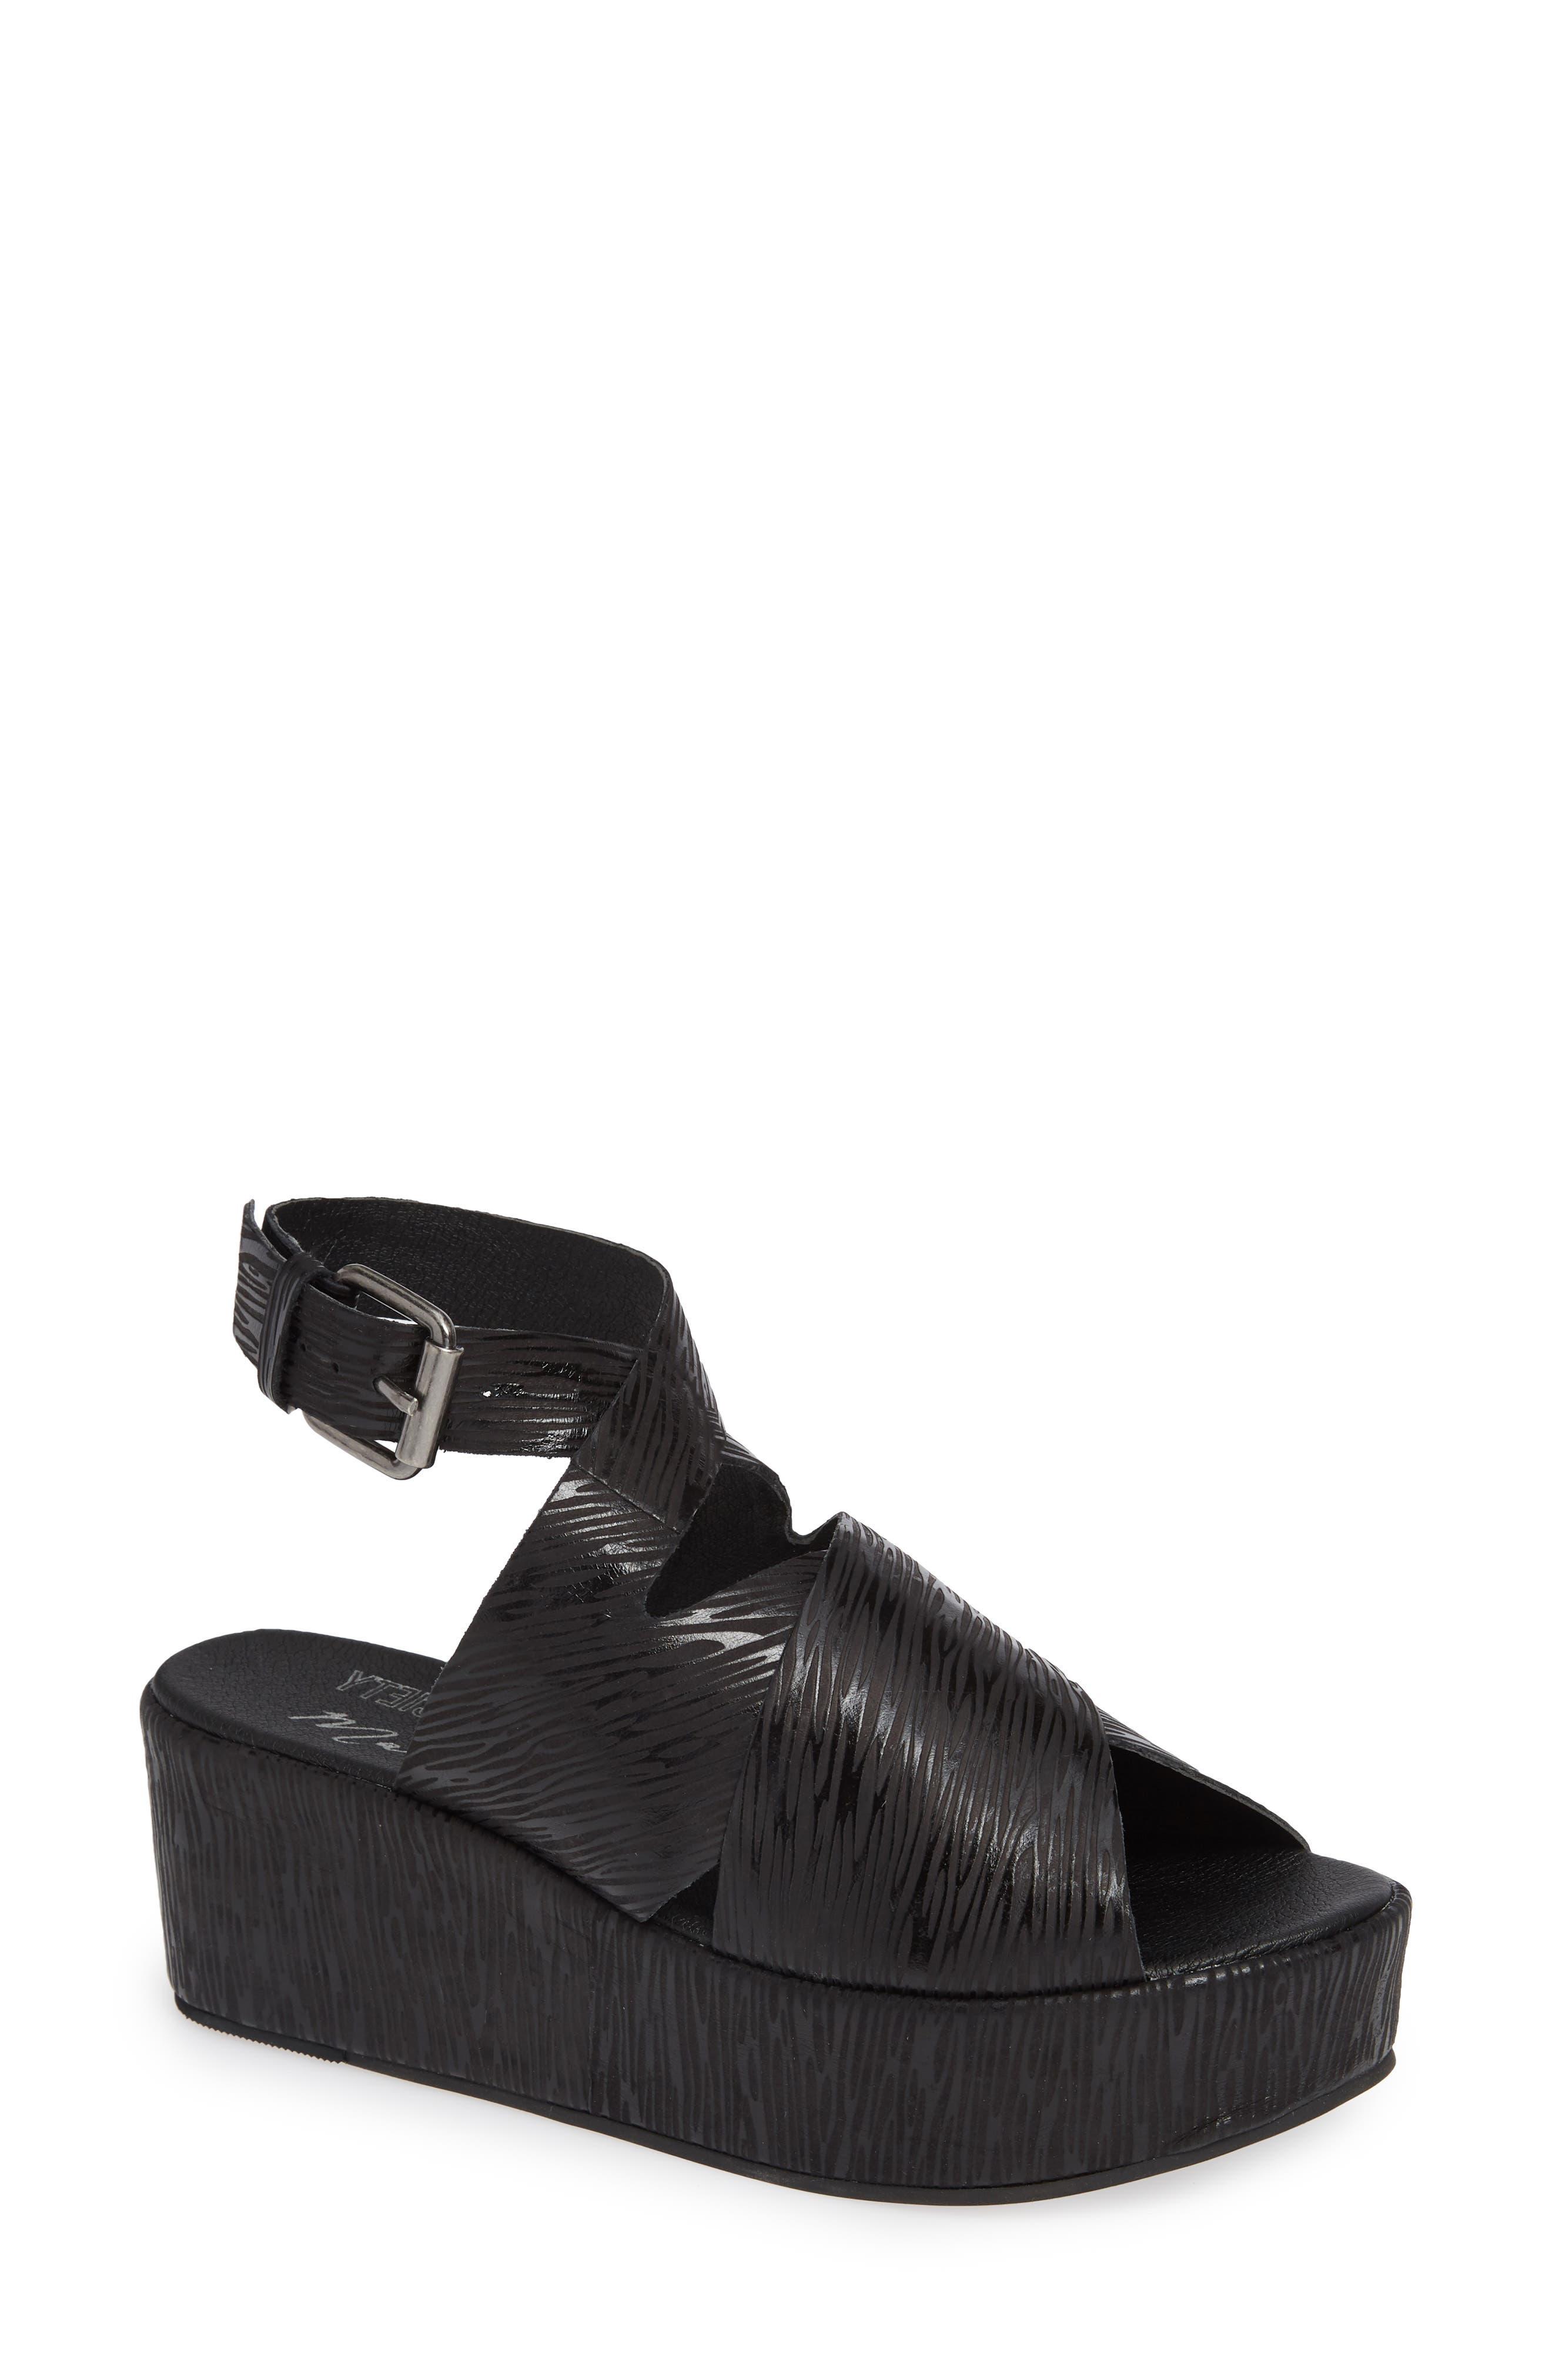 Runway Wedge Sandal,                             Main thumbnail 1, color,                             Black Lizard Print Leather